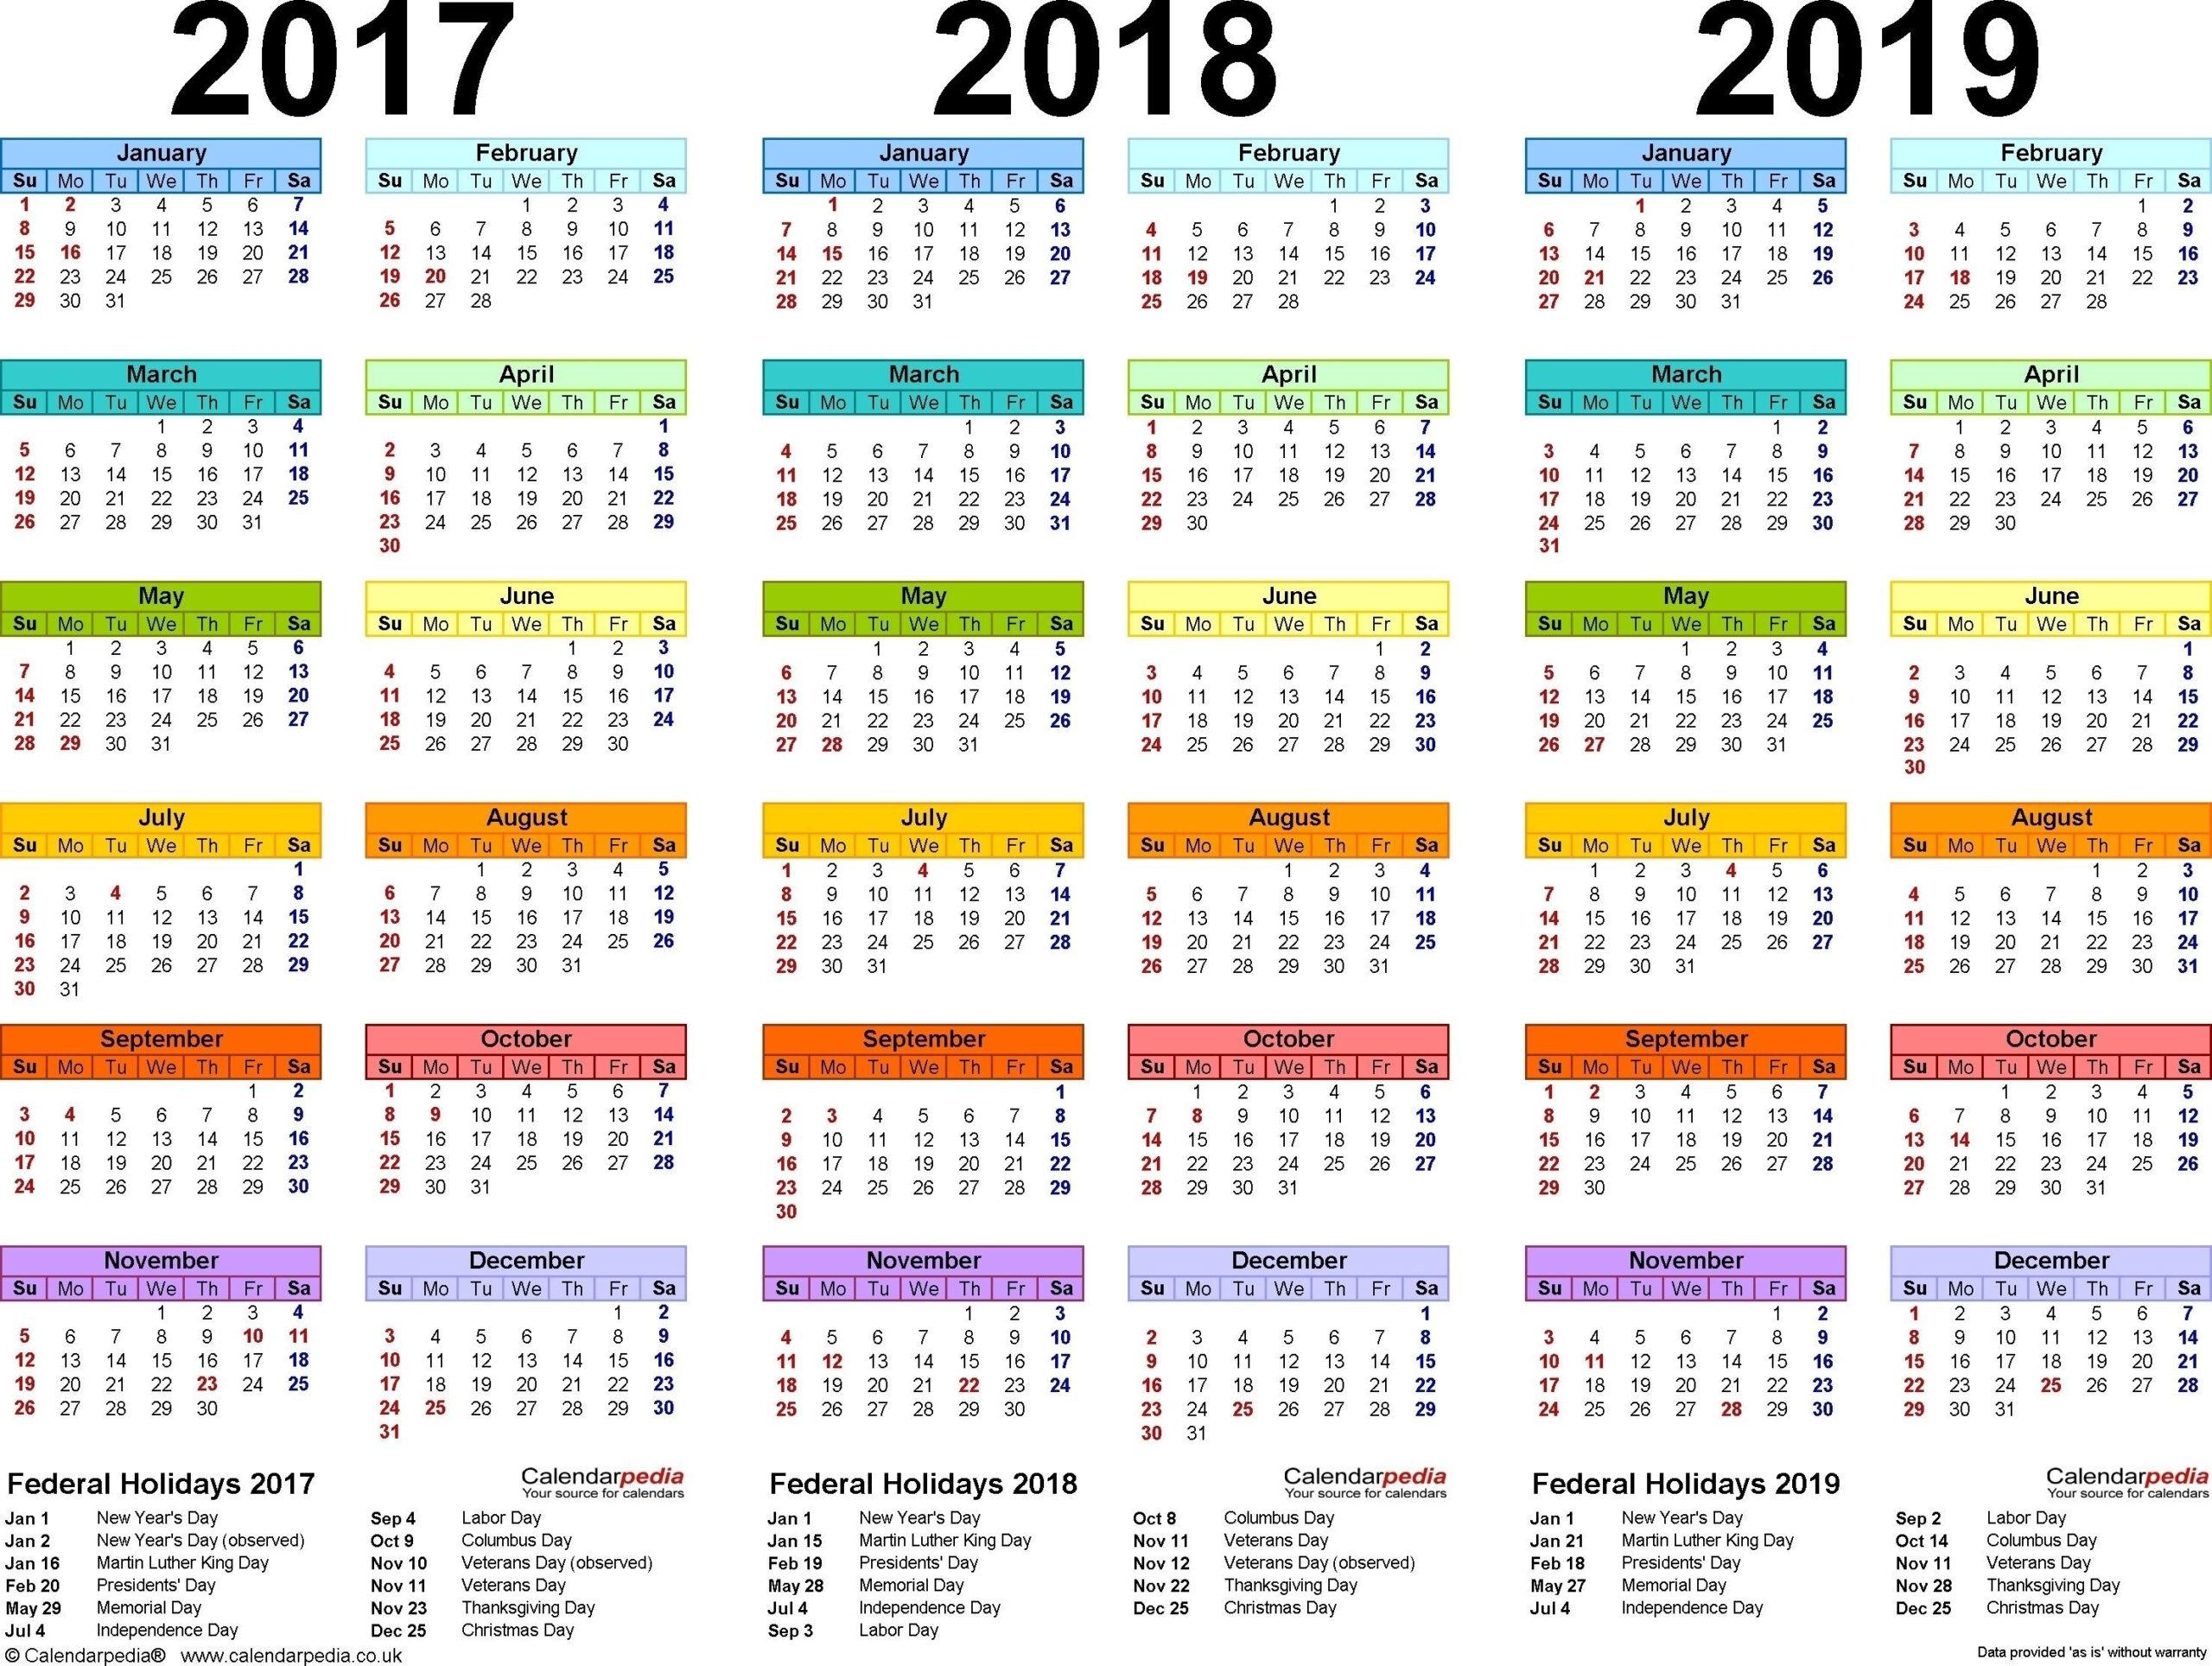 Depo-Provera Calendar 2020 2021 - Template Calendar Design